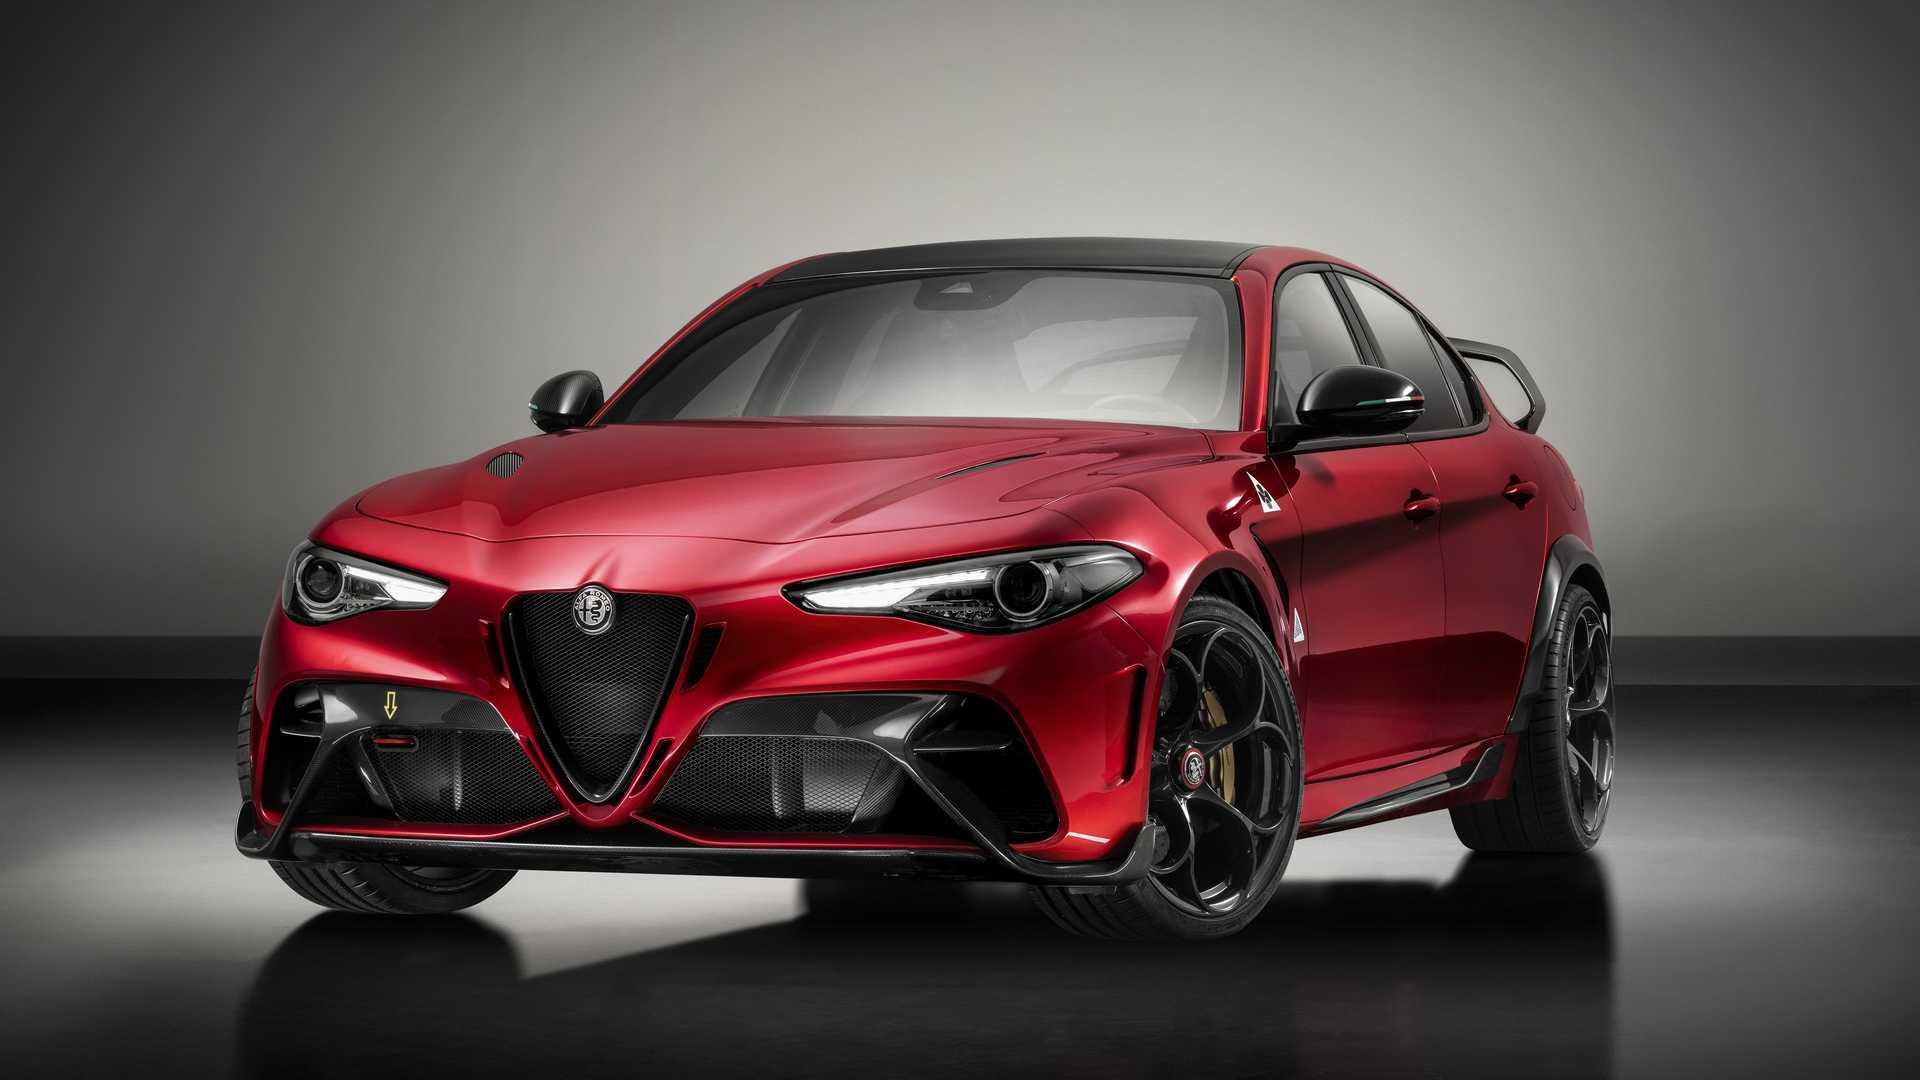 F1车手测试调校 Giulia GTA限量版将于明年入华